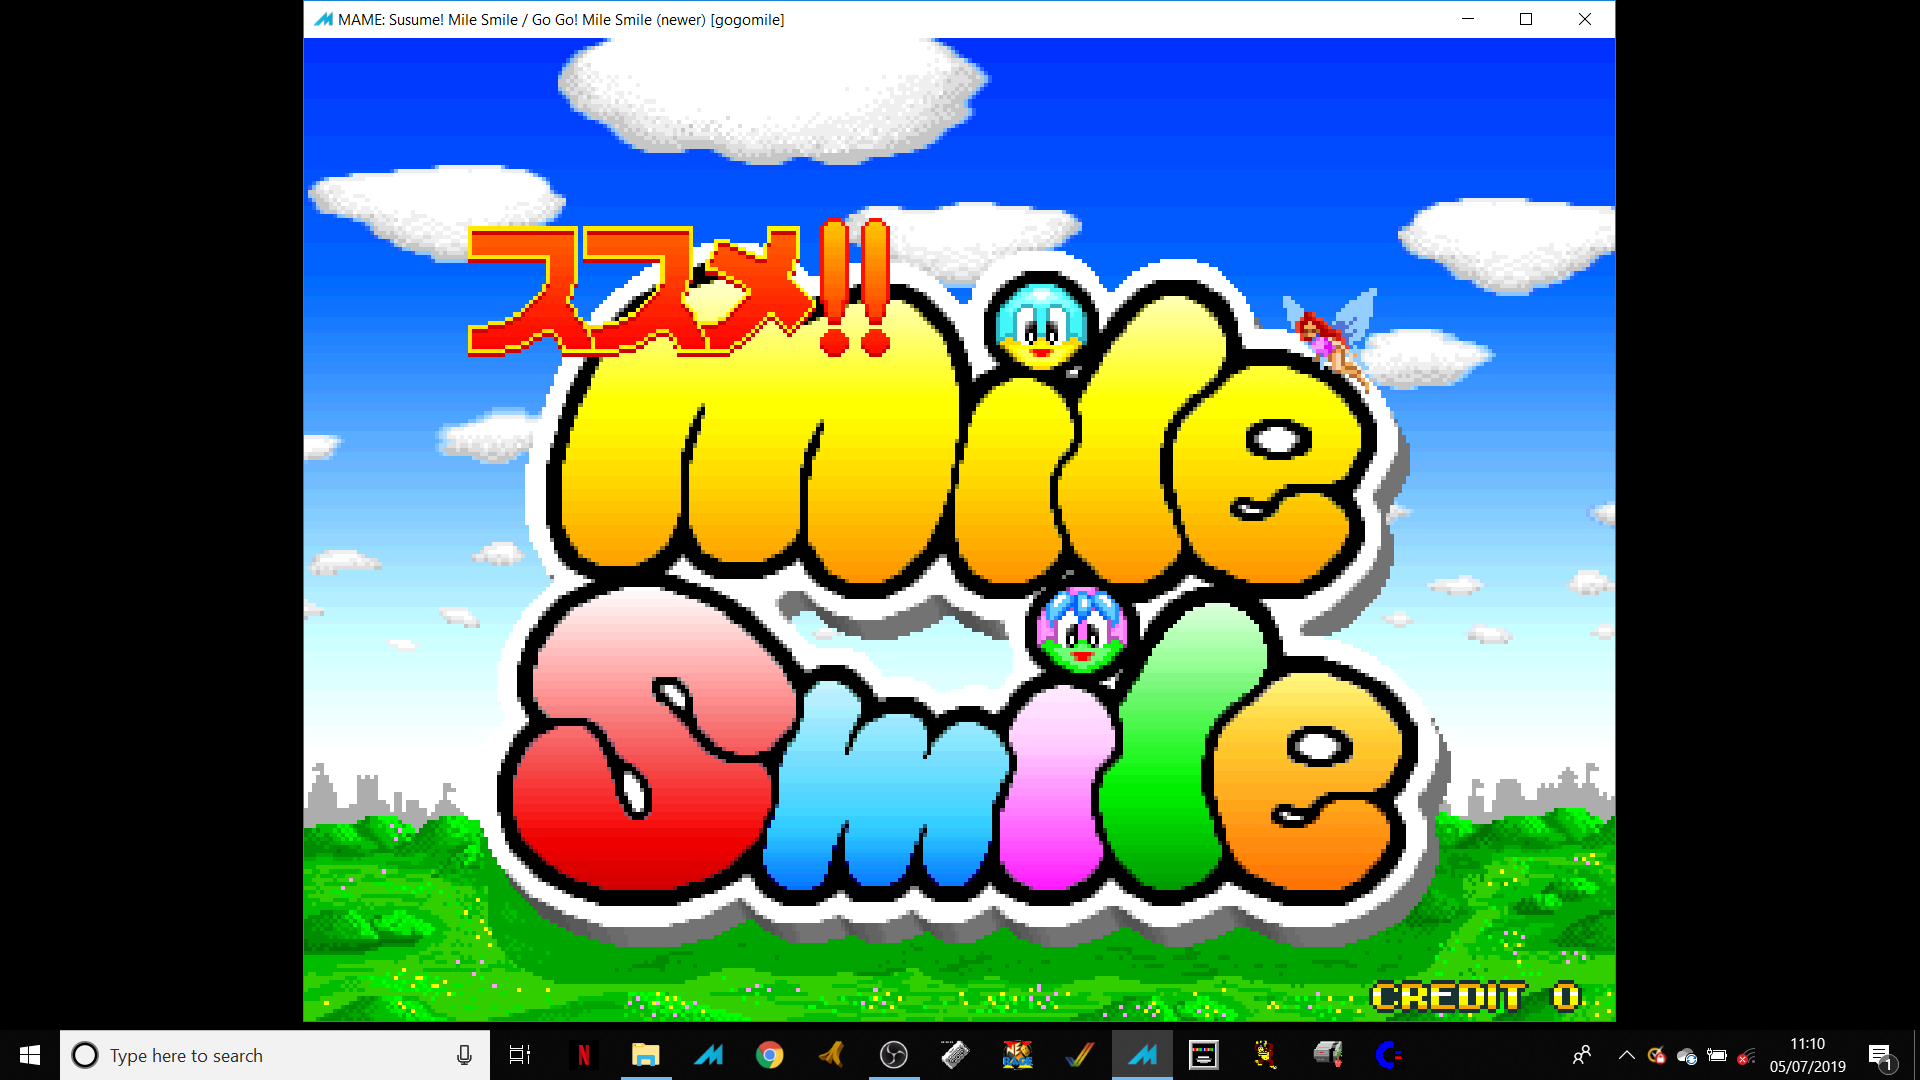 ministorm04: Go Go! Mile Smile [gogomile] (Arcade Emulated / M.A.M.E.) 202,460 points on 2019-07-08 12:17:15